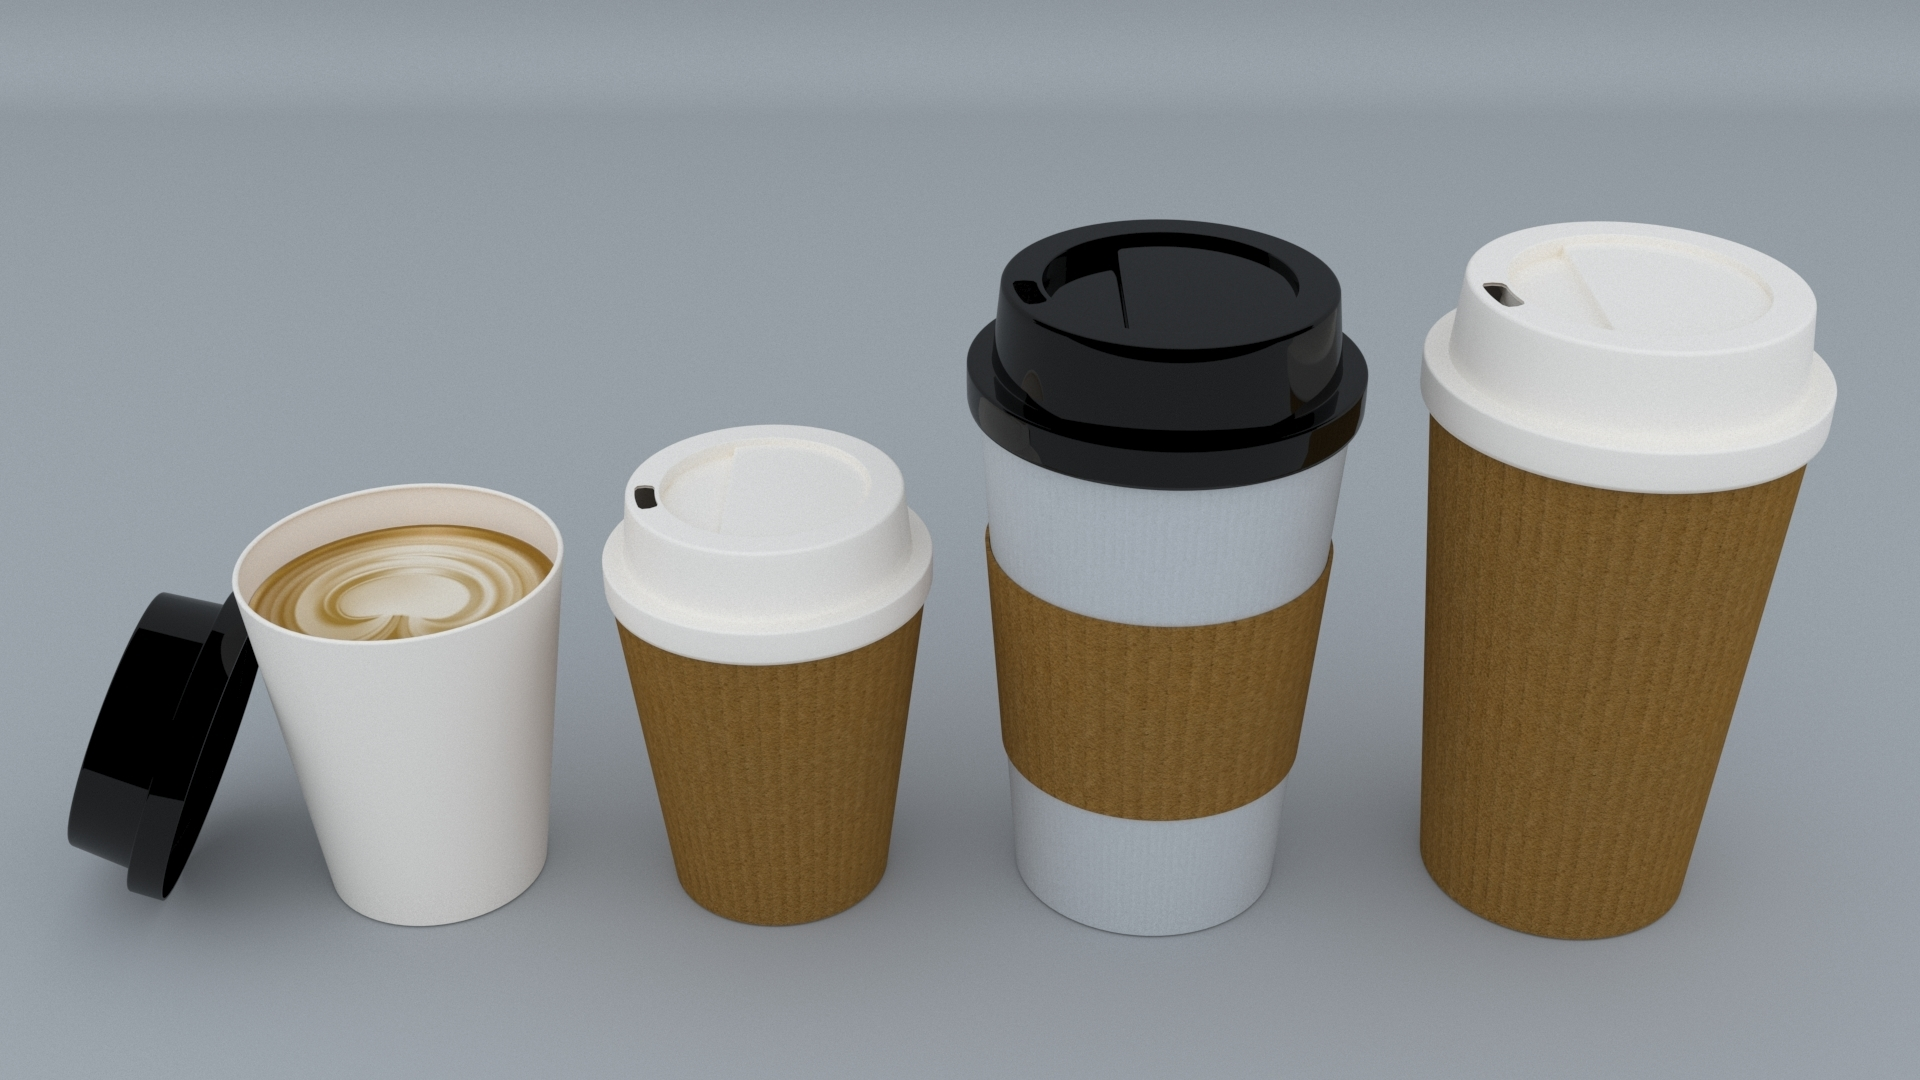 2.jpg Download STL file Coffee Cup • 3D printing template, illusioncreators1979